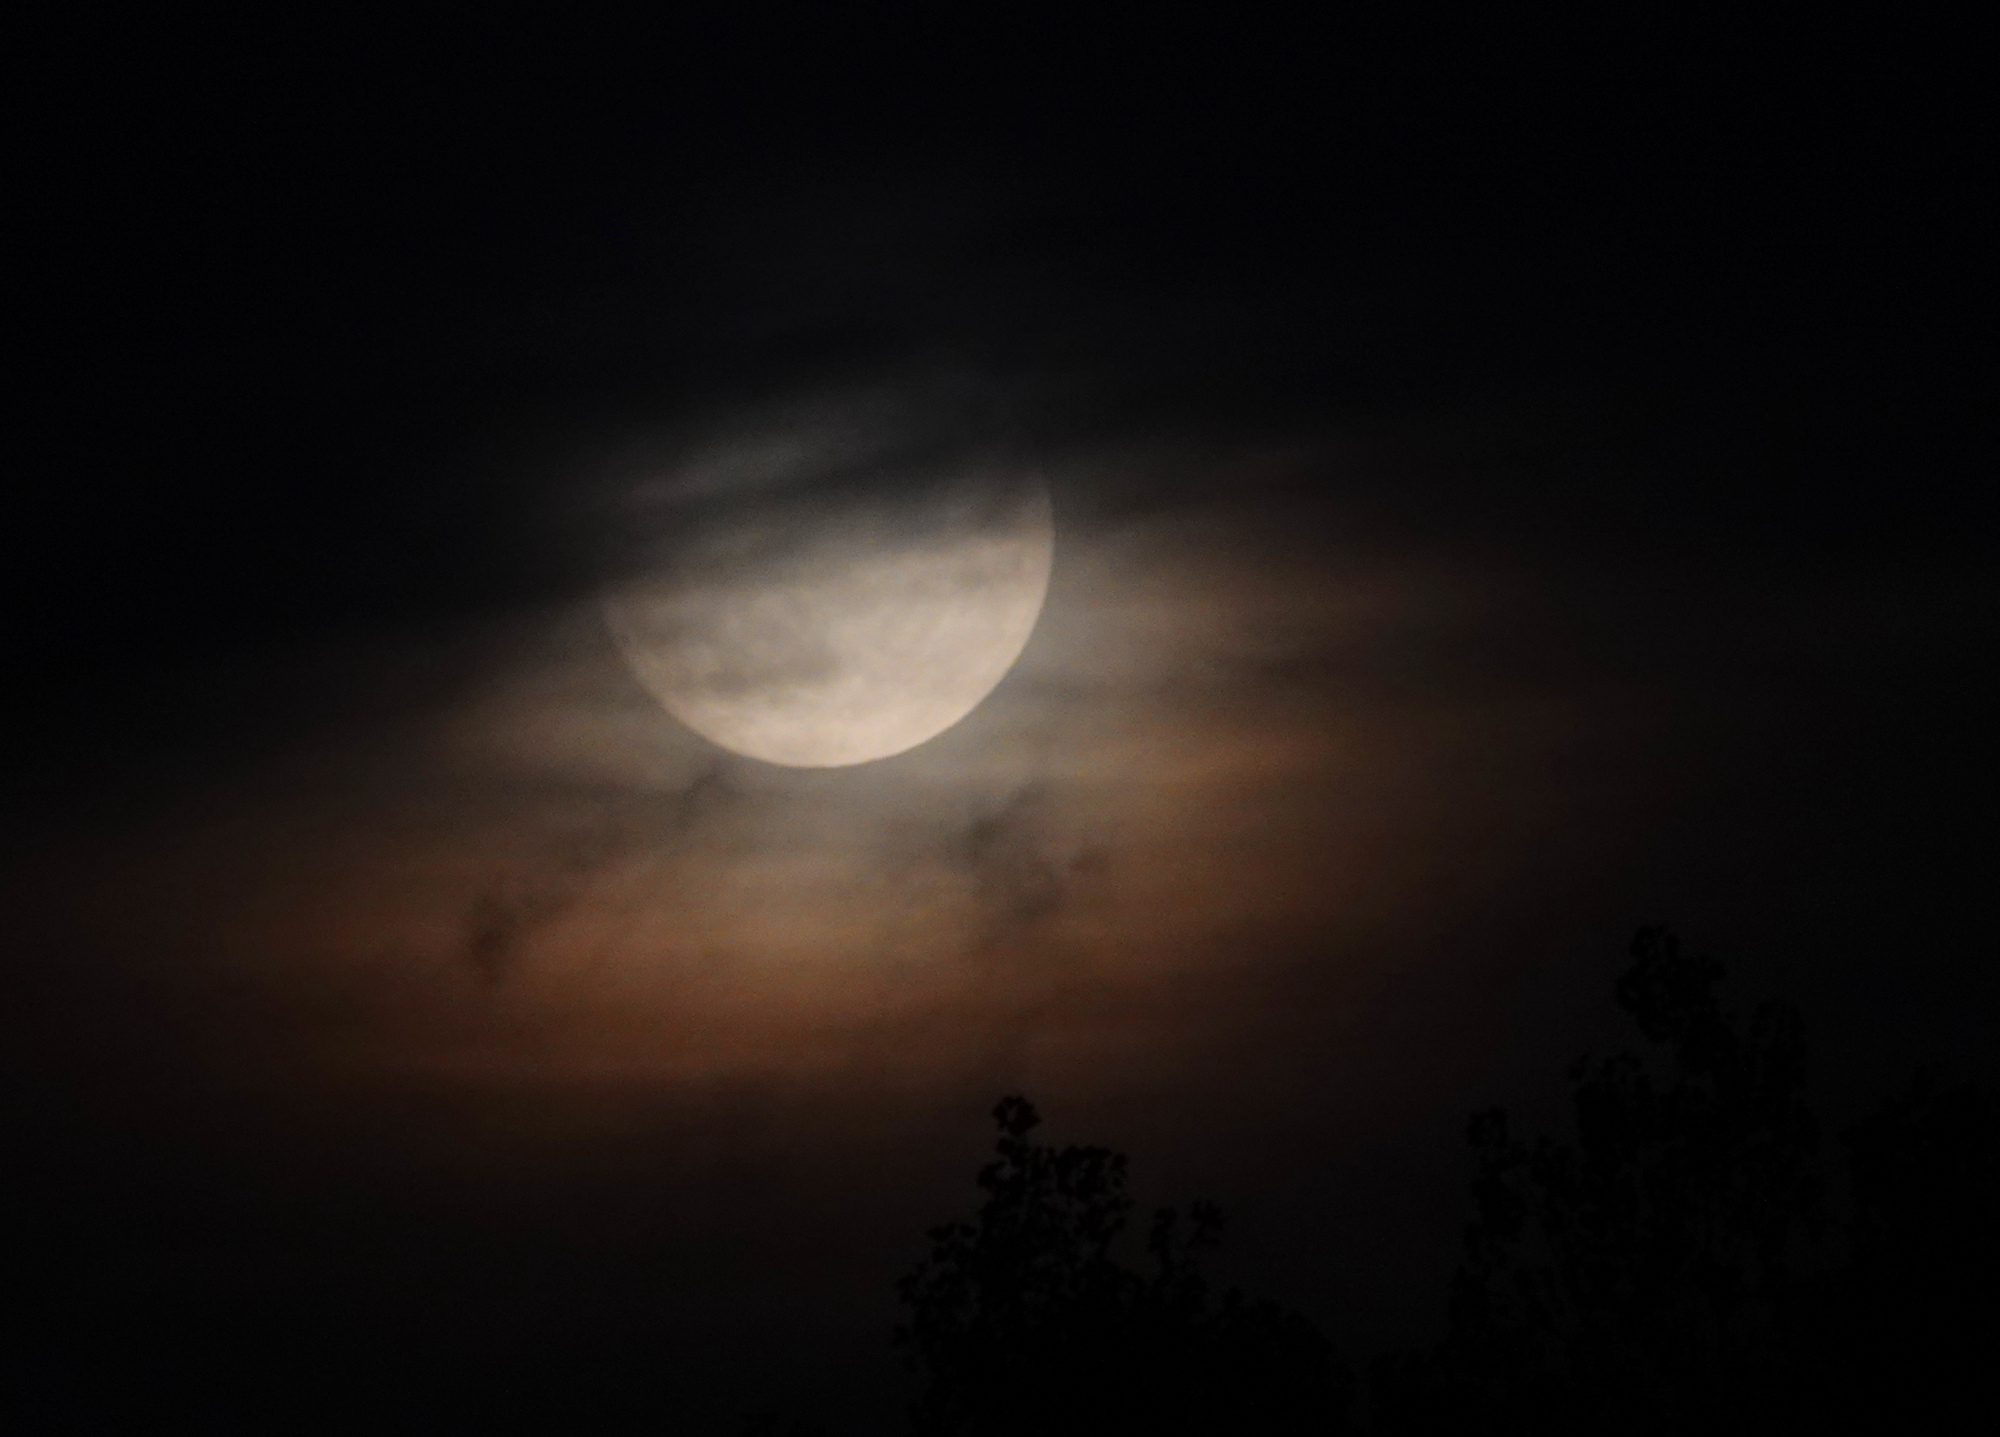 lune3.thumb.JPG.eddbe03f19d1e821fae1187b1fb05f22.JPG